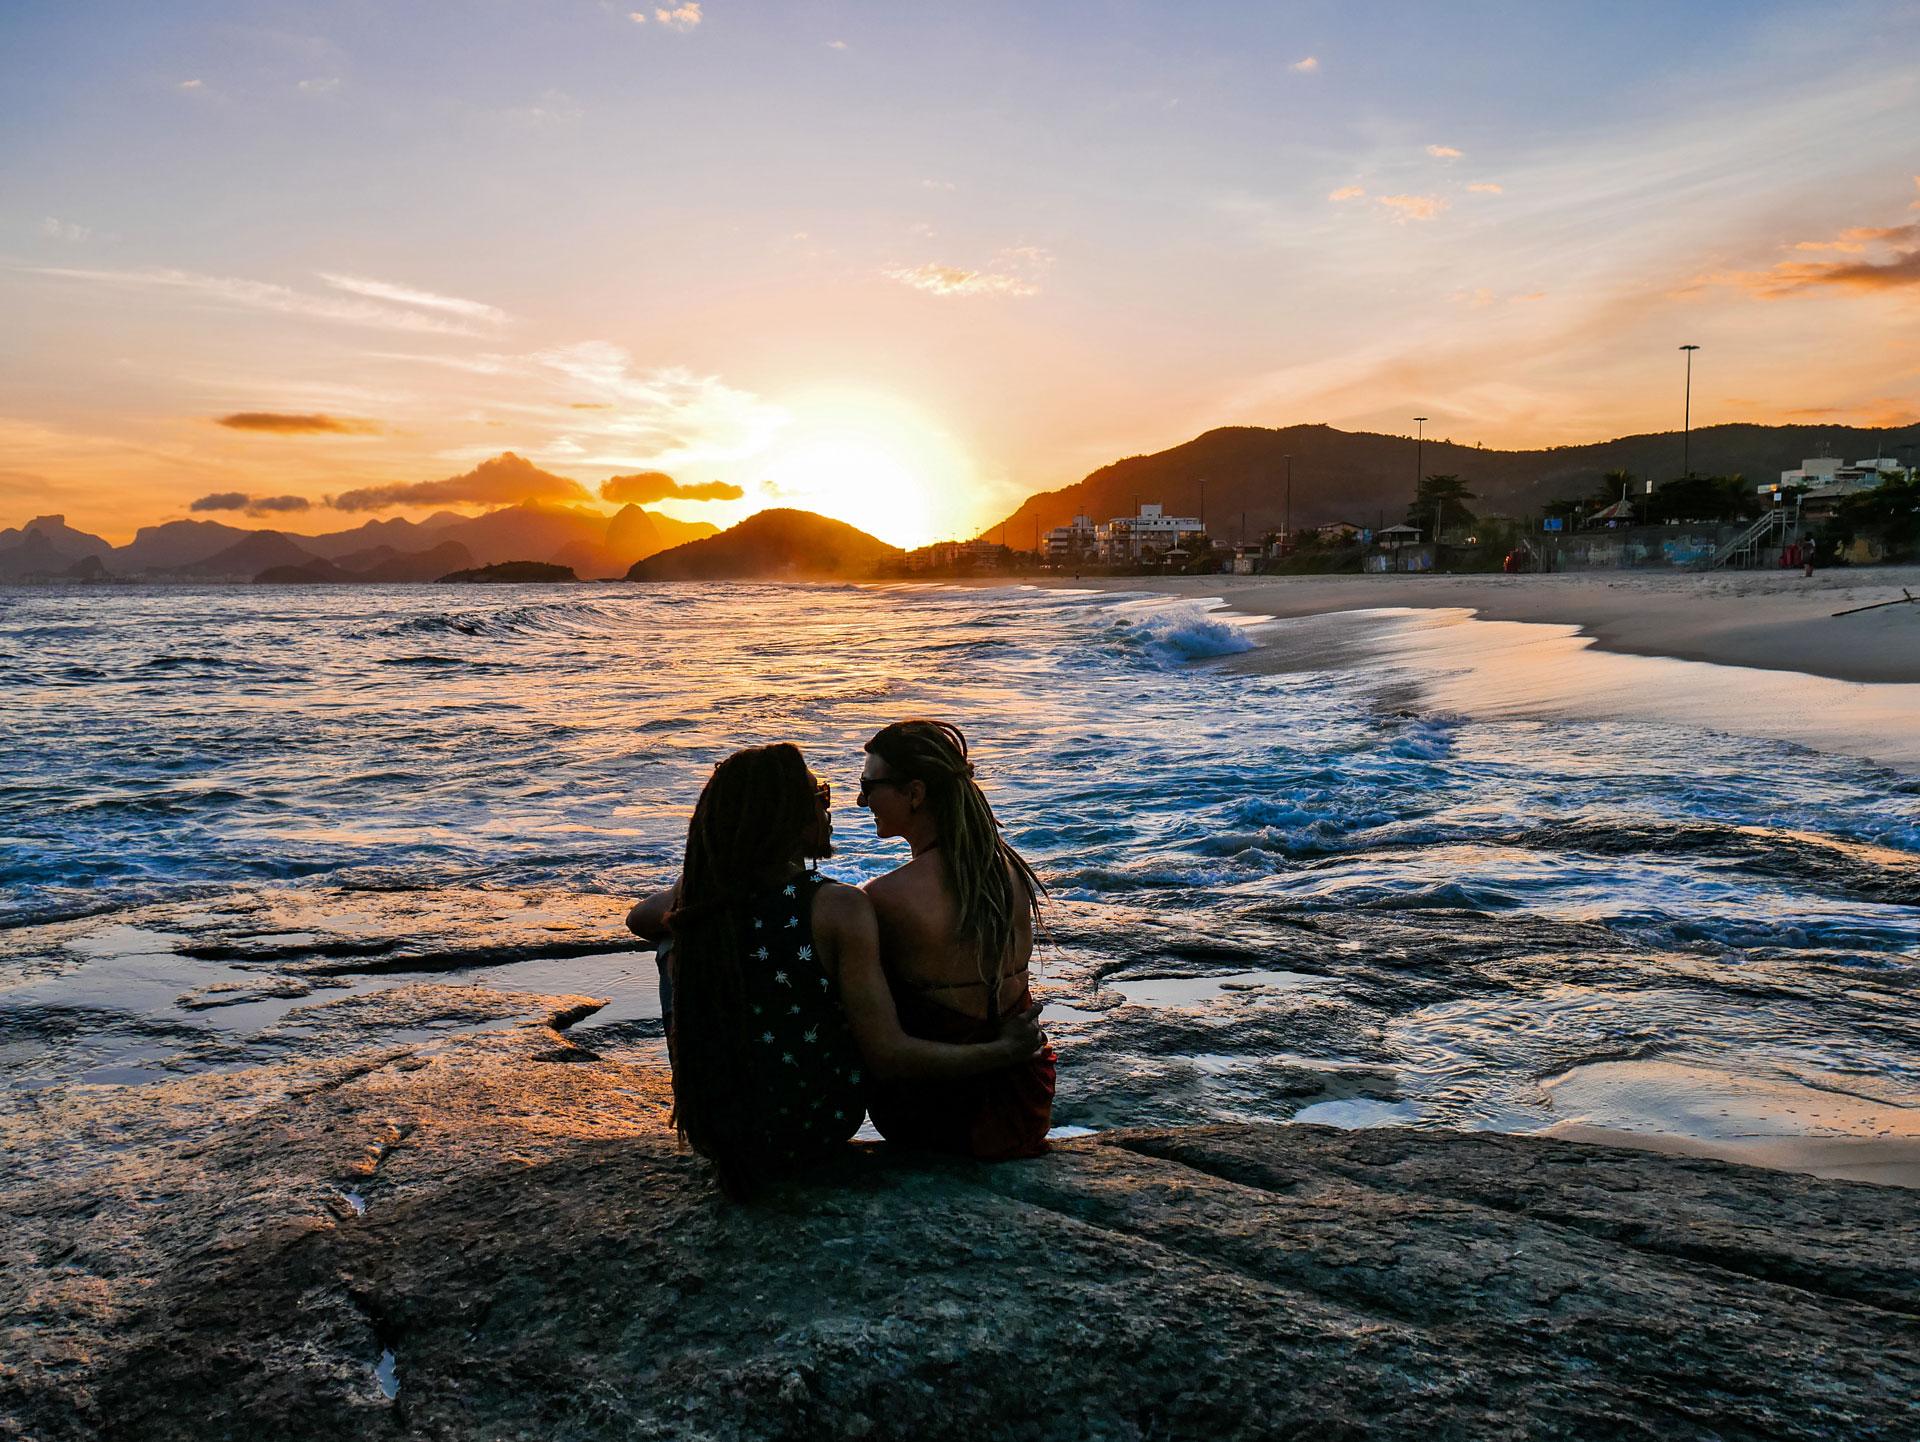 Rasta couple at Piratininga beach during sunset in Niterói, Brazil